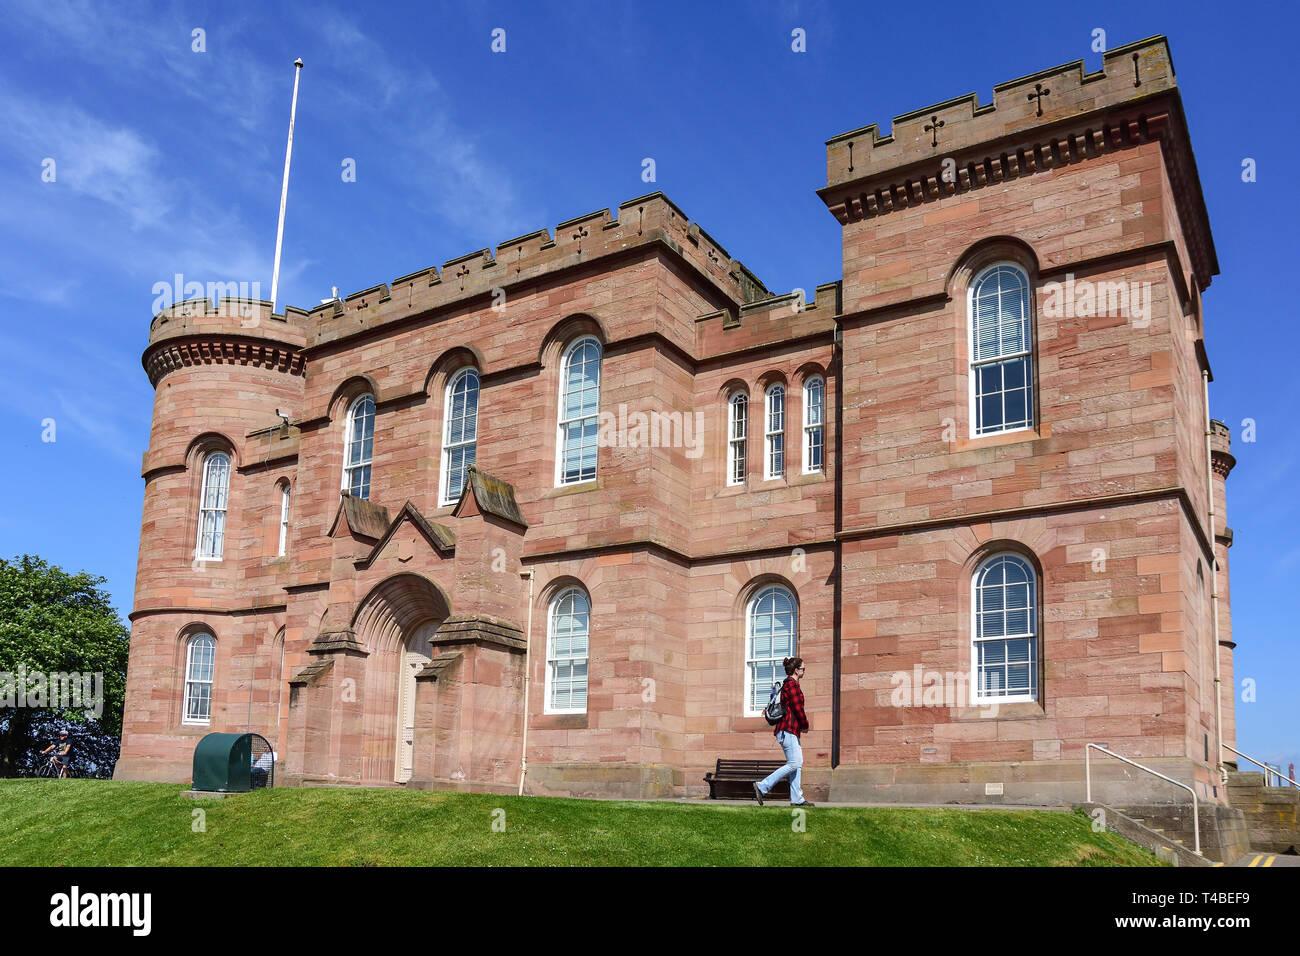 Inverness Castle, Castle Hill, Inverness, Highland, Scotland, United Kingdom - Stock Image